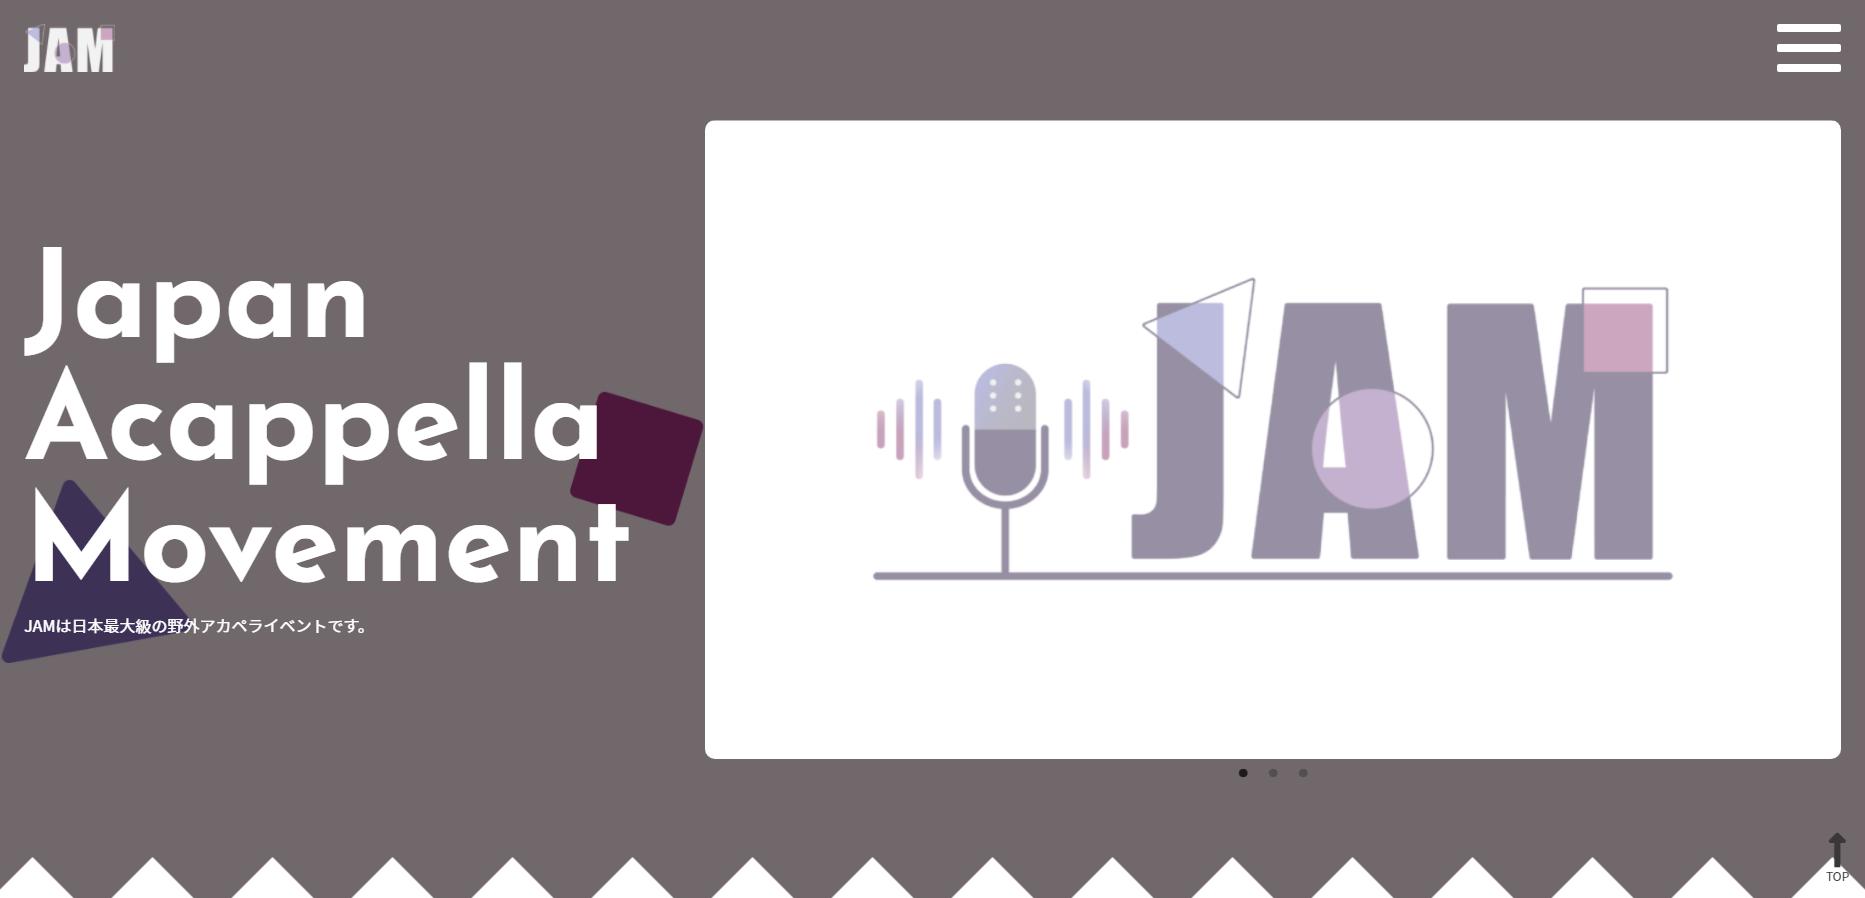 Japan Acappella Movement 公式ホームページ